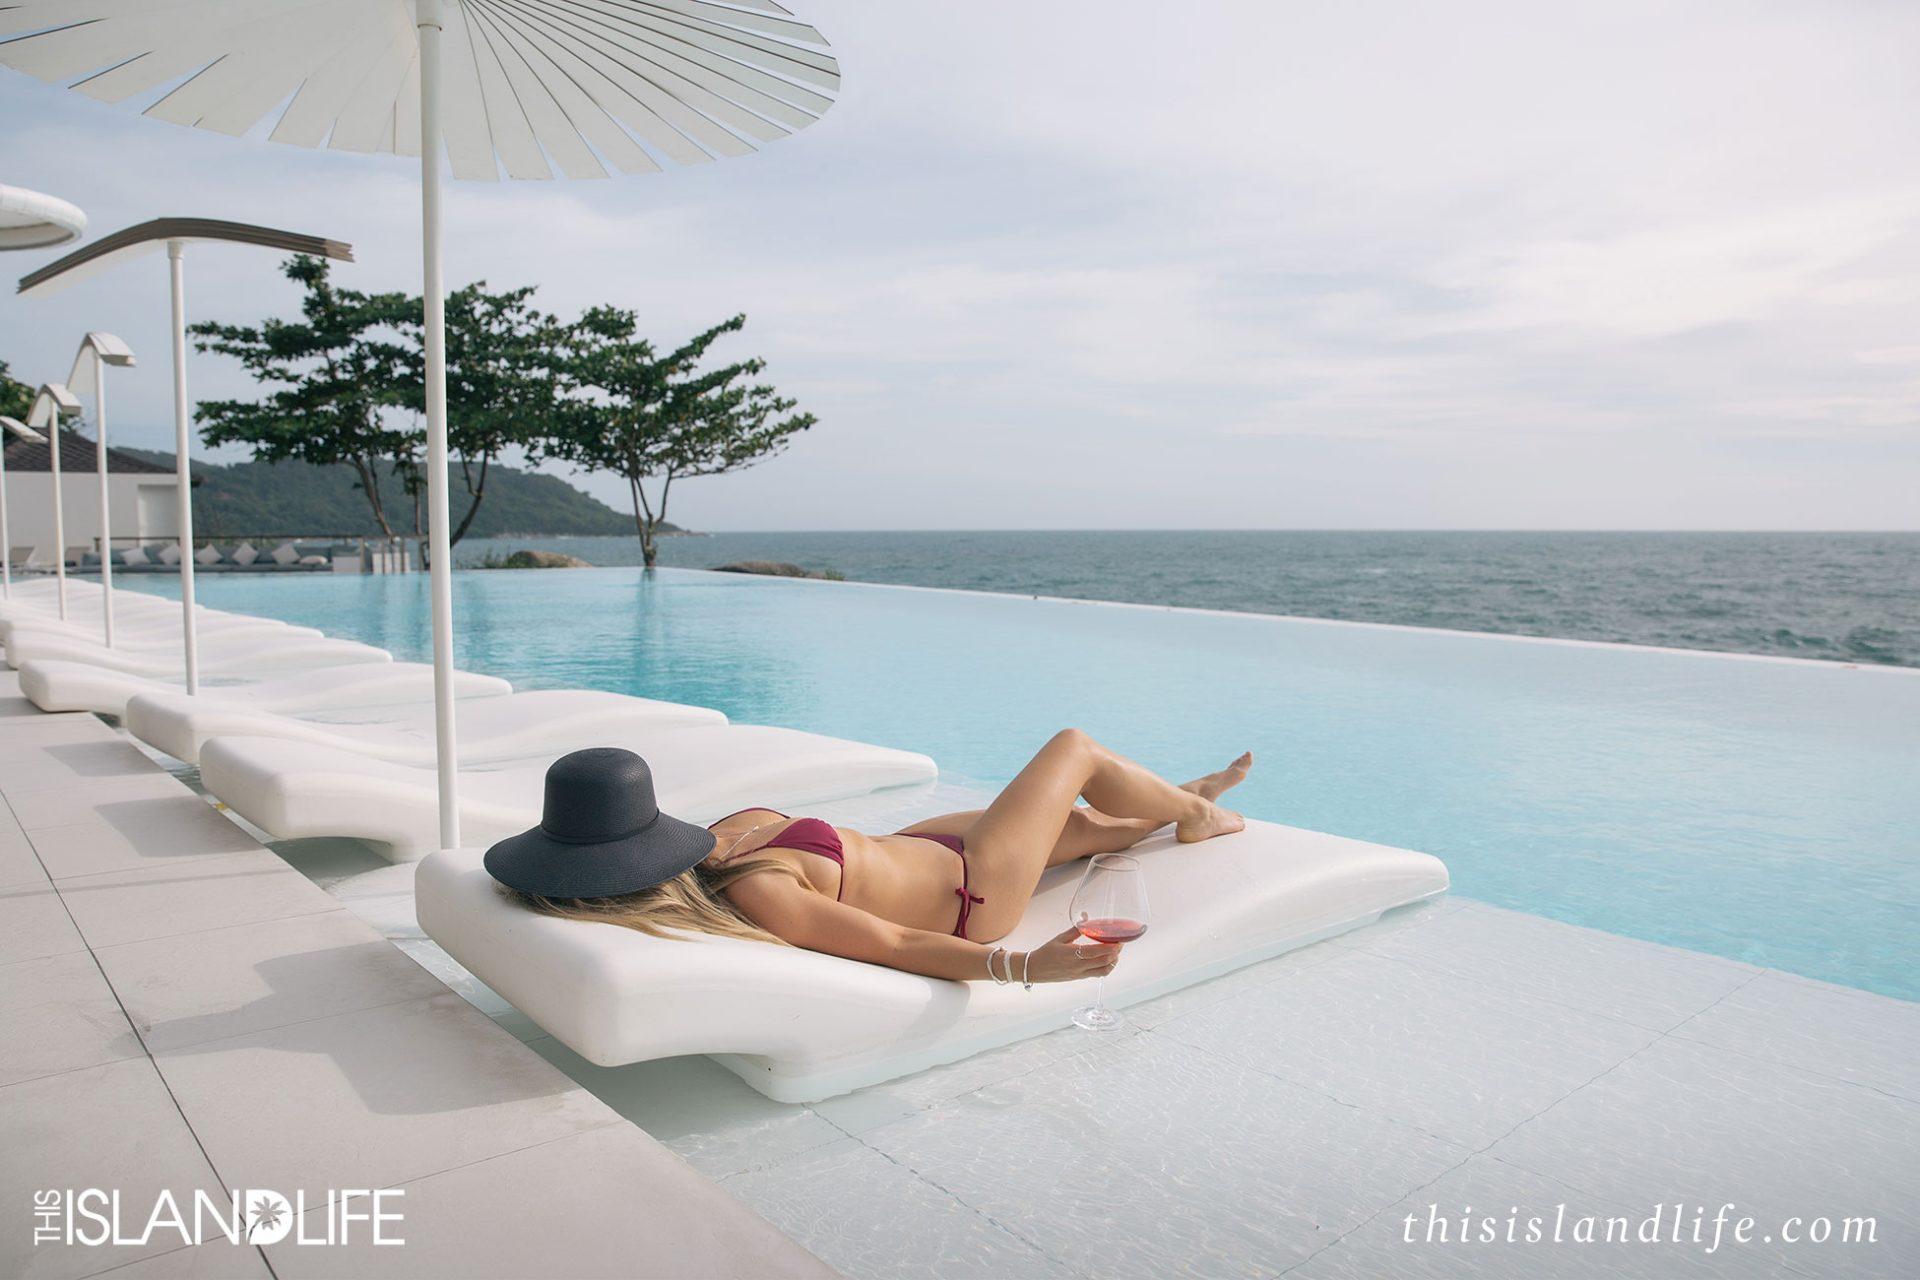 this-island-life-_-bangkok-_-phuket-_-kata-rocks-_-2-wm